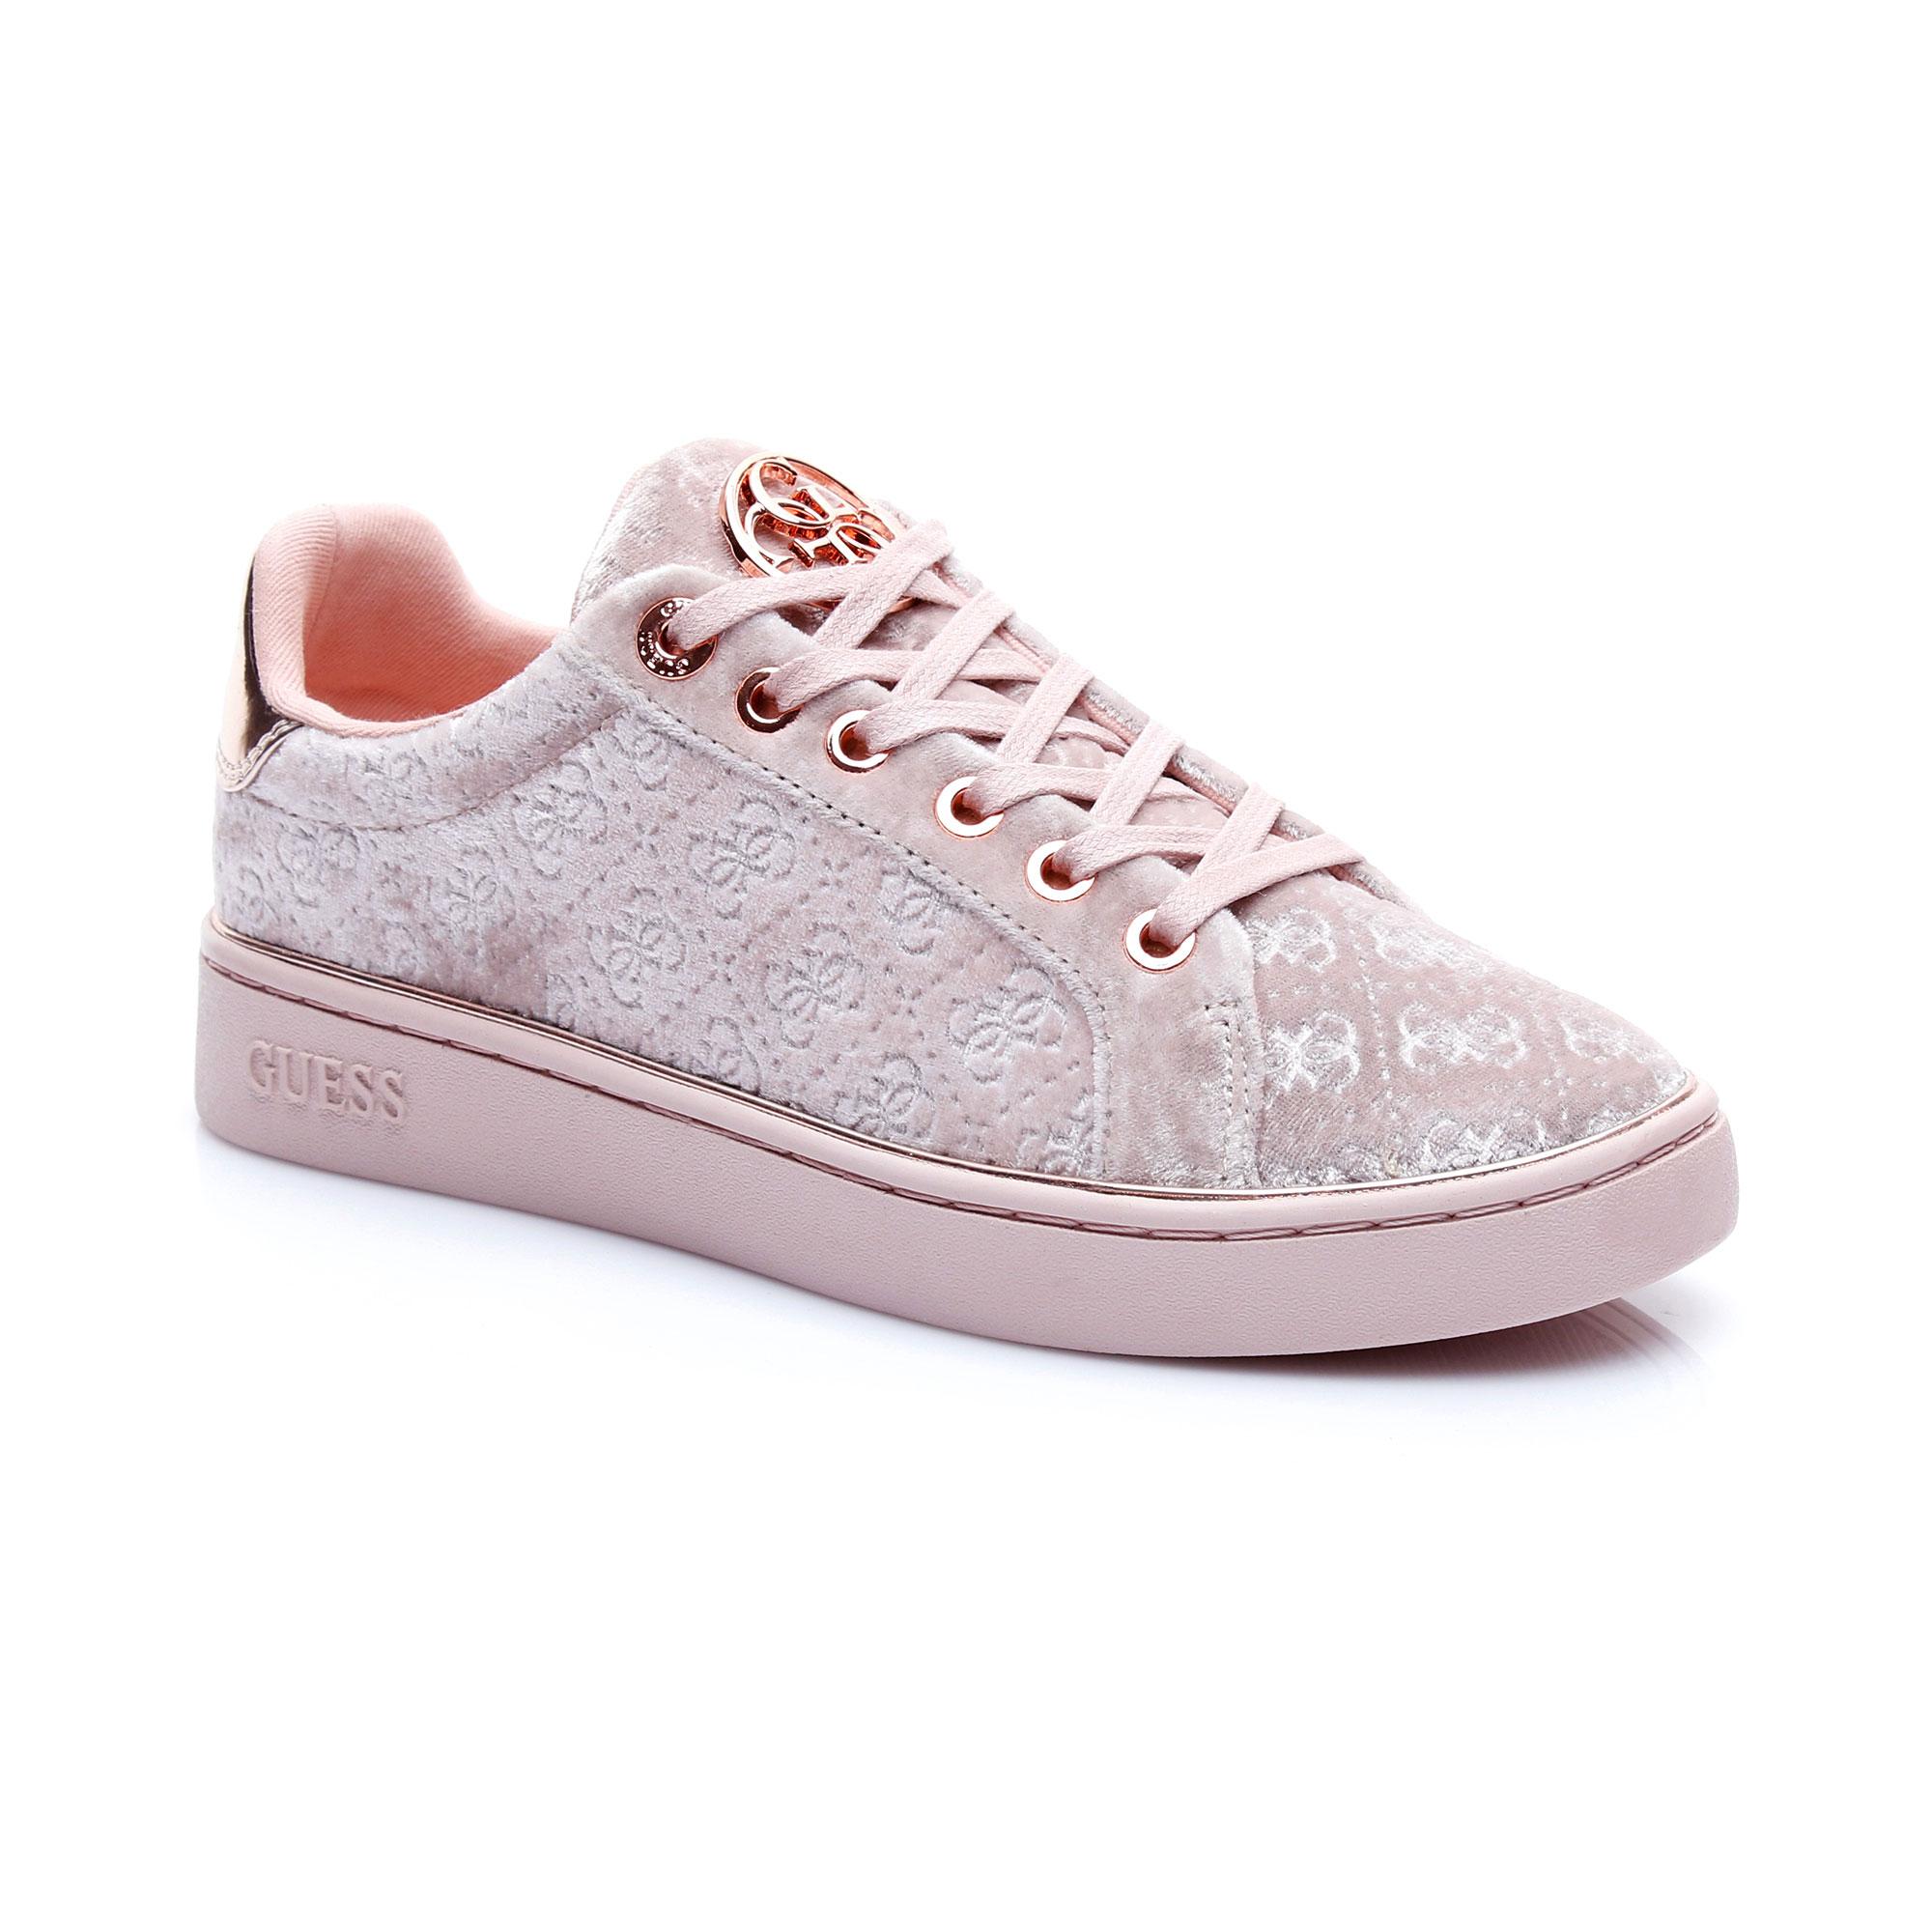 Guess Brayza Actıve Lady Kadın Pembe Sneaker